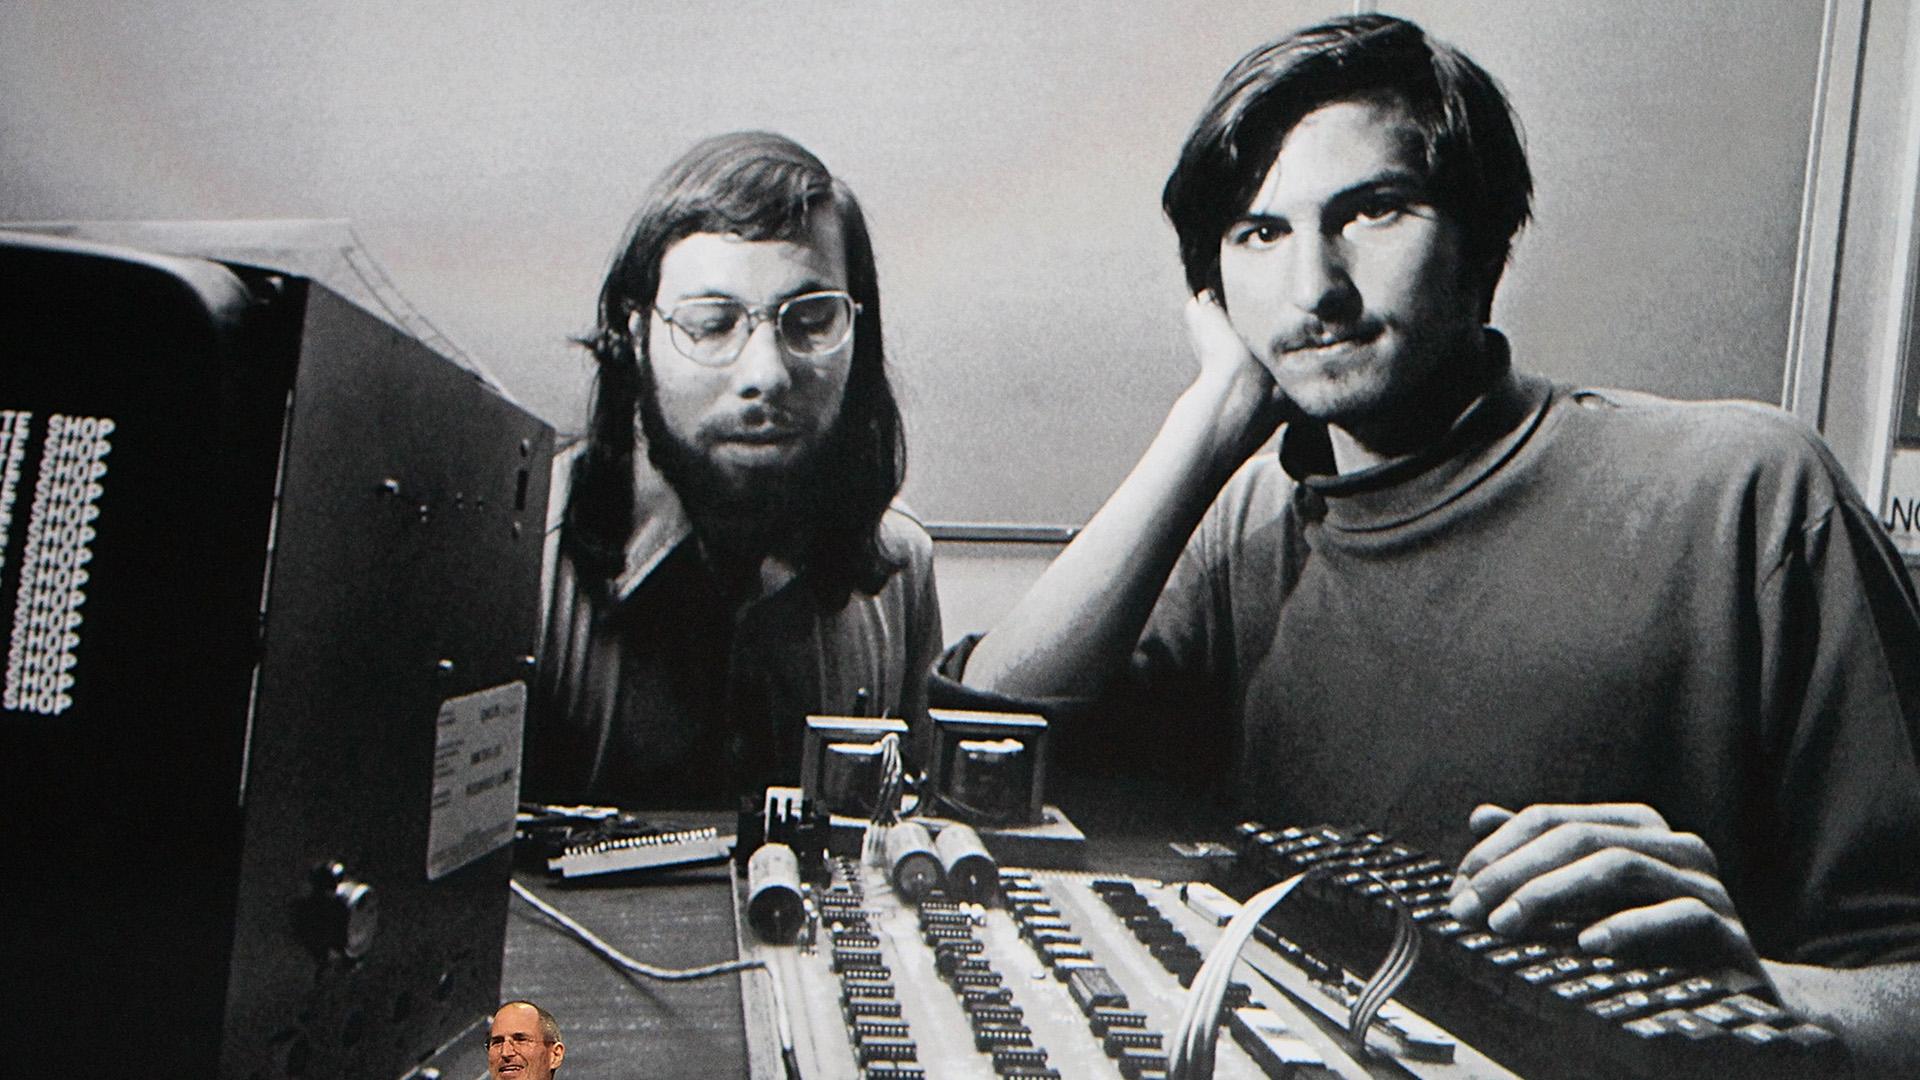 Steve Jobs junto a Steve Wozniak durante los comienzos de la empresa (Foto de Justin Sullivan/Getty Images)